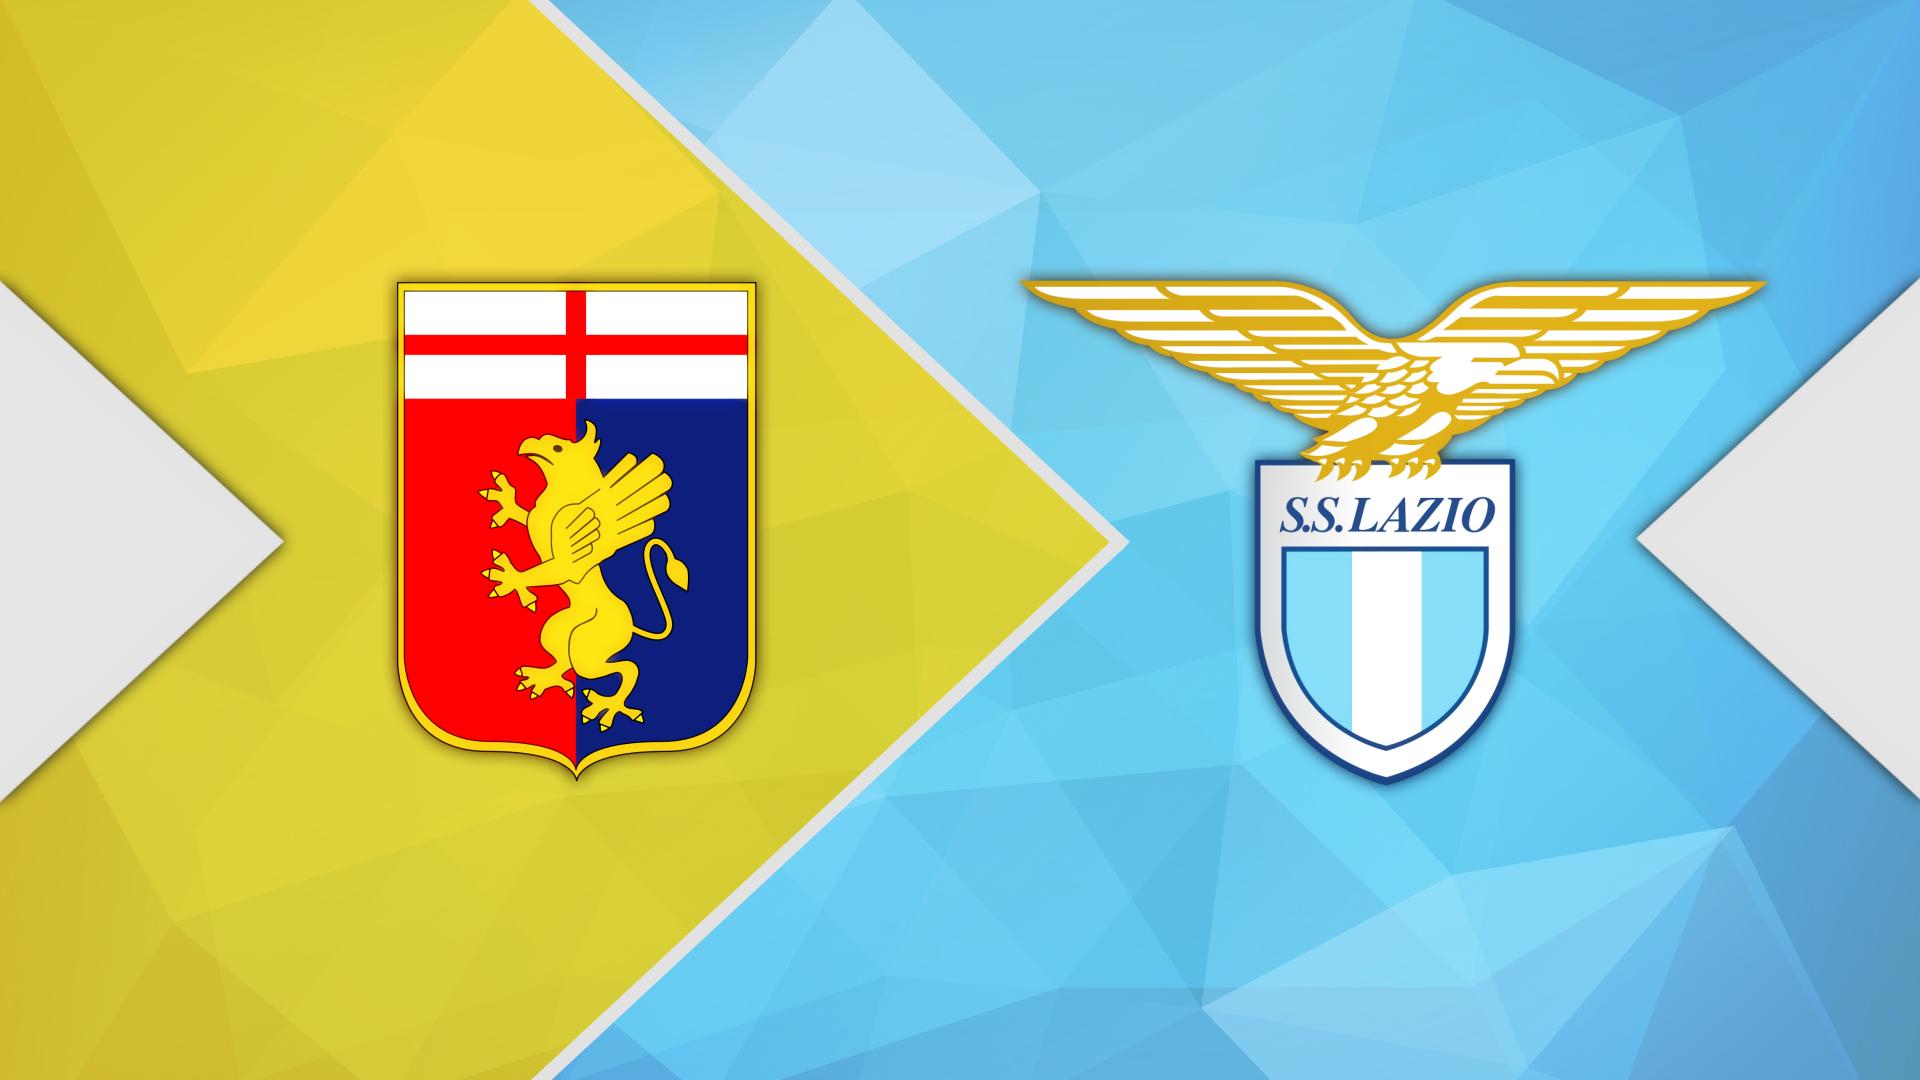 Genoa v lazio betting preview nfl ndsu vs richmond football betting odds